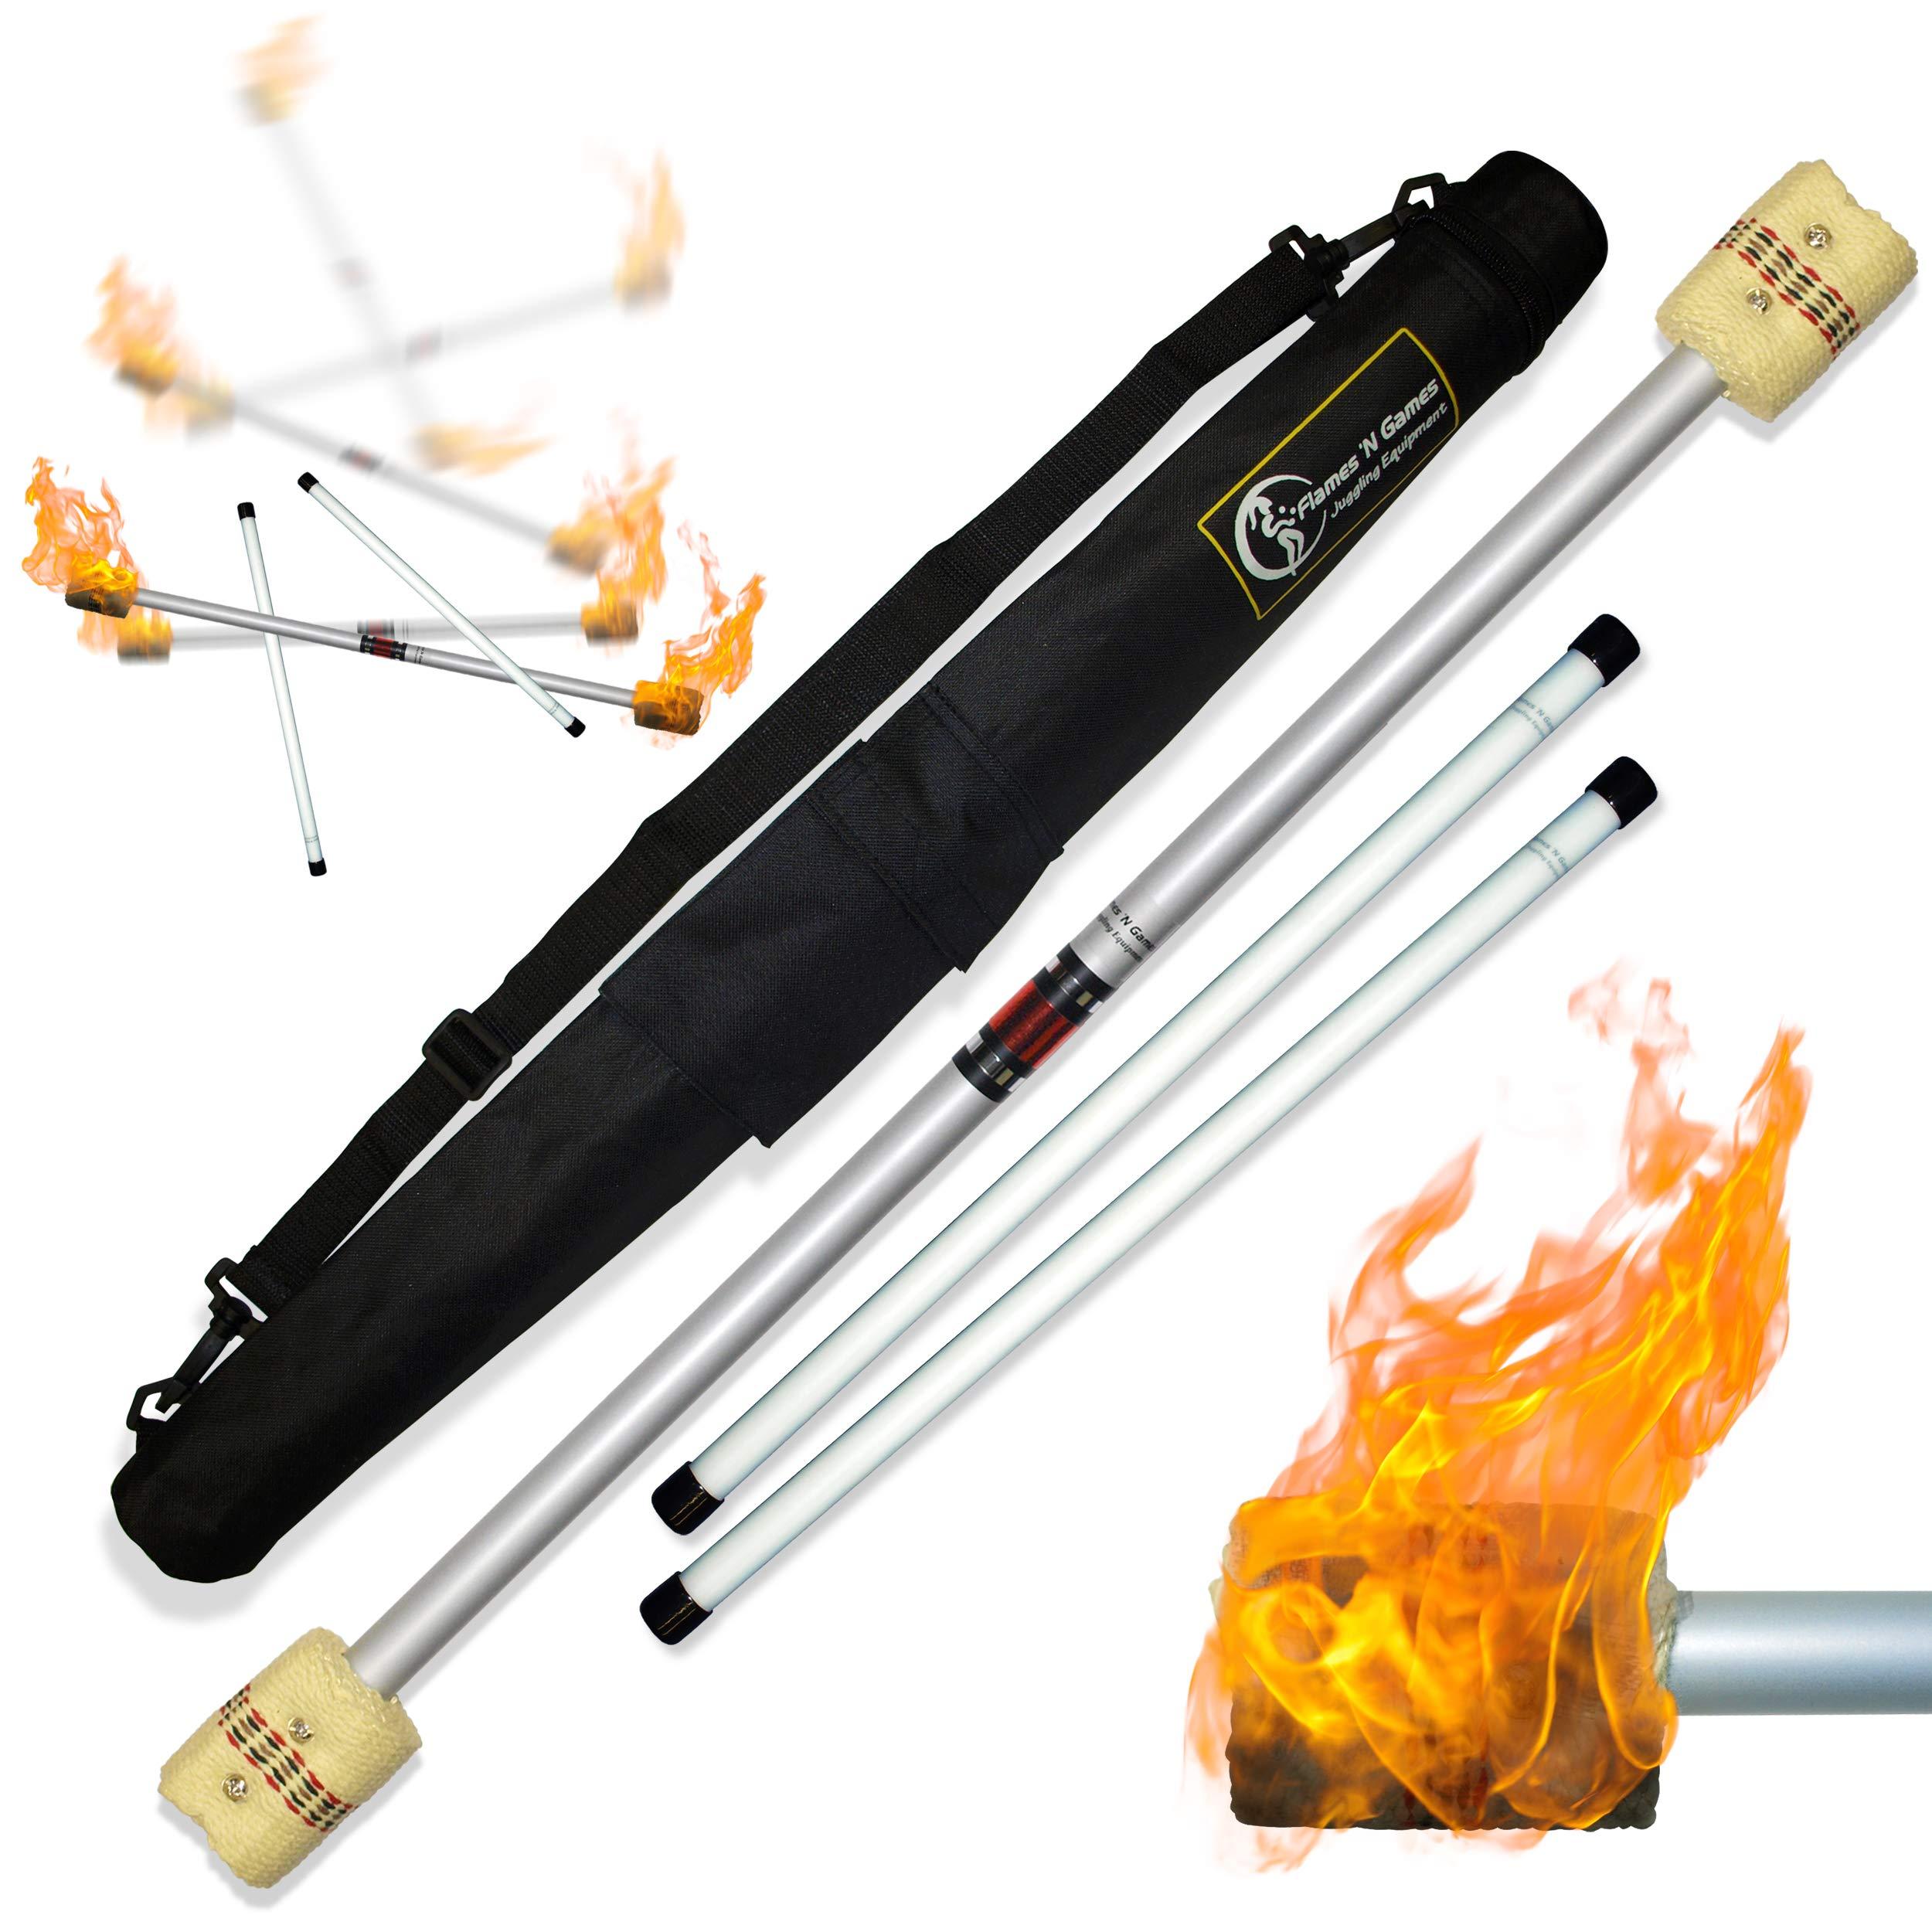 Flames N Games FIRE Devil Stick Set (65mm Wicks) Ultra-Strong FIBRE Sticks + Travel Bag! Juggling Devil sticks for Beginners & Pro's alike!